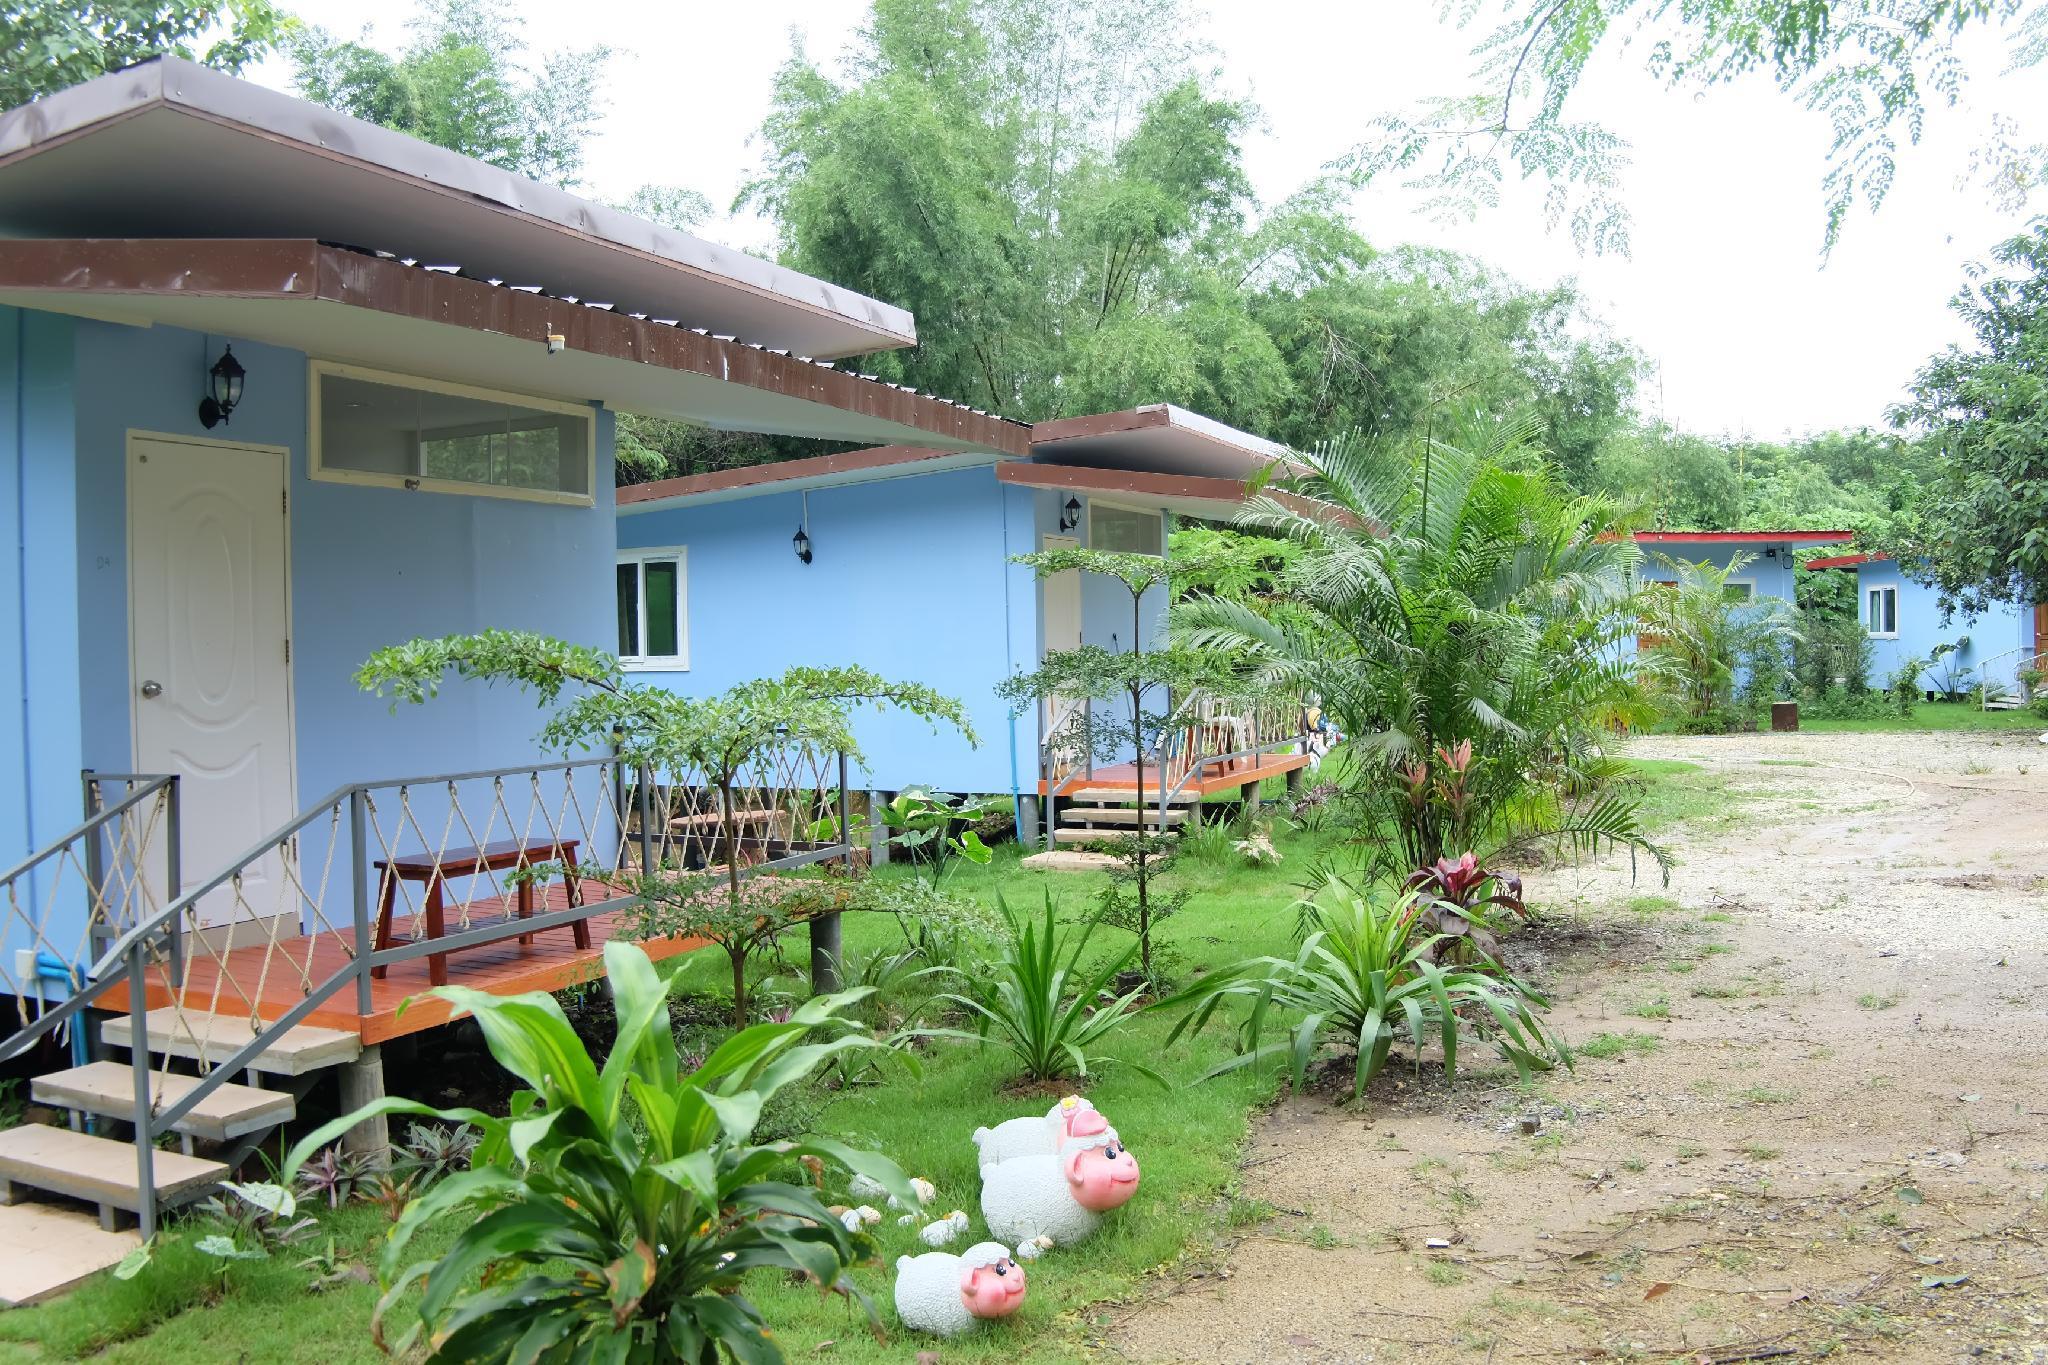 Tararin Hindad Hot Spring Resort Thong Pha Phum Thailand